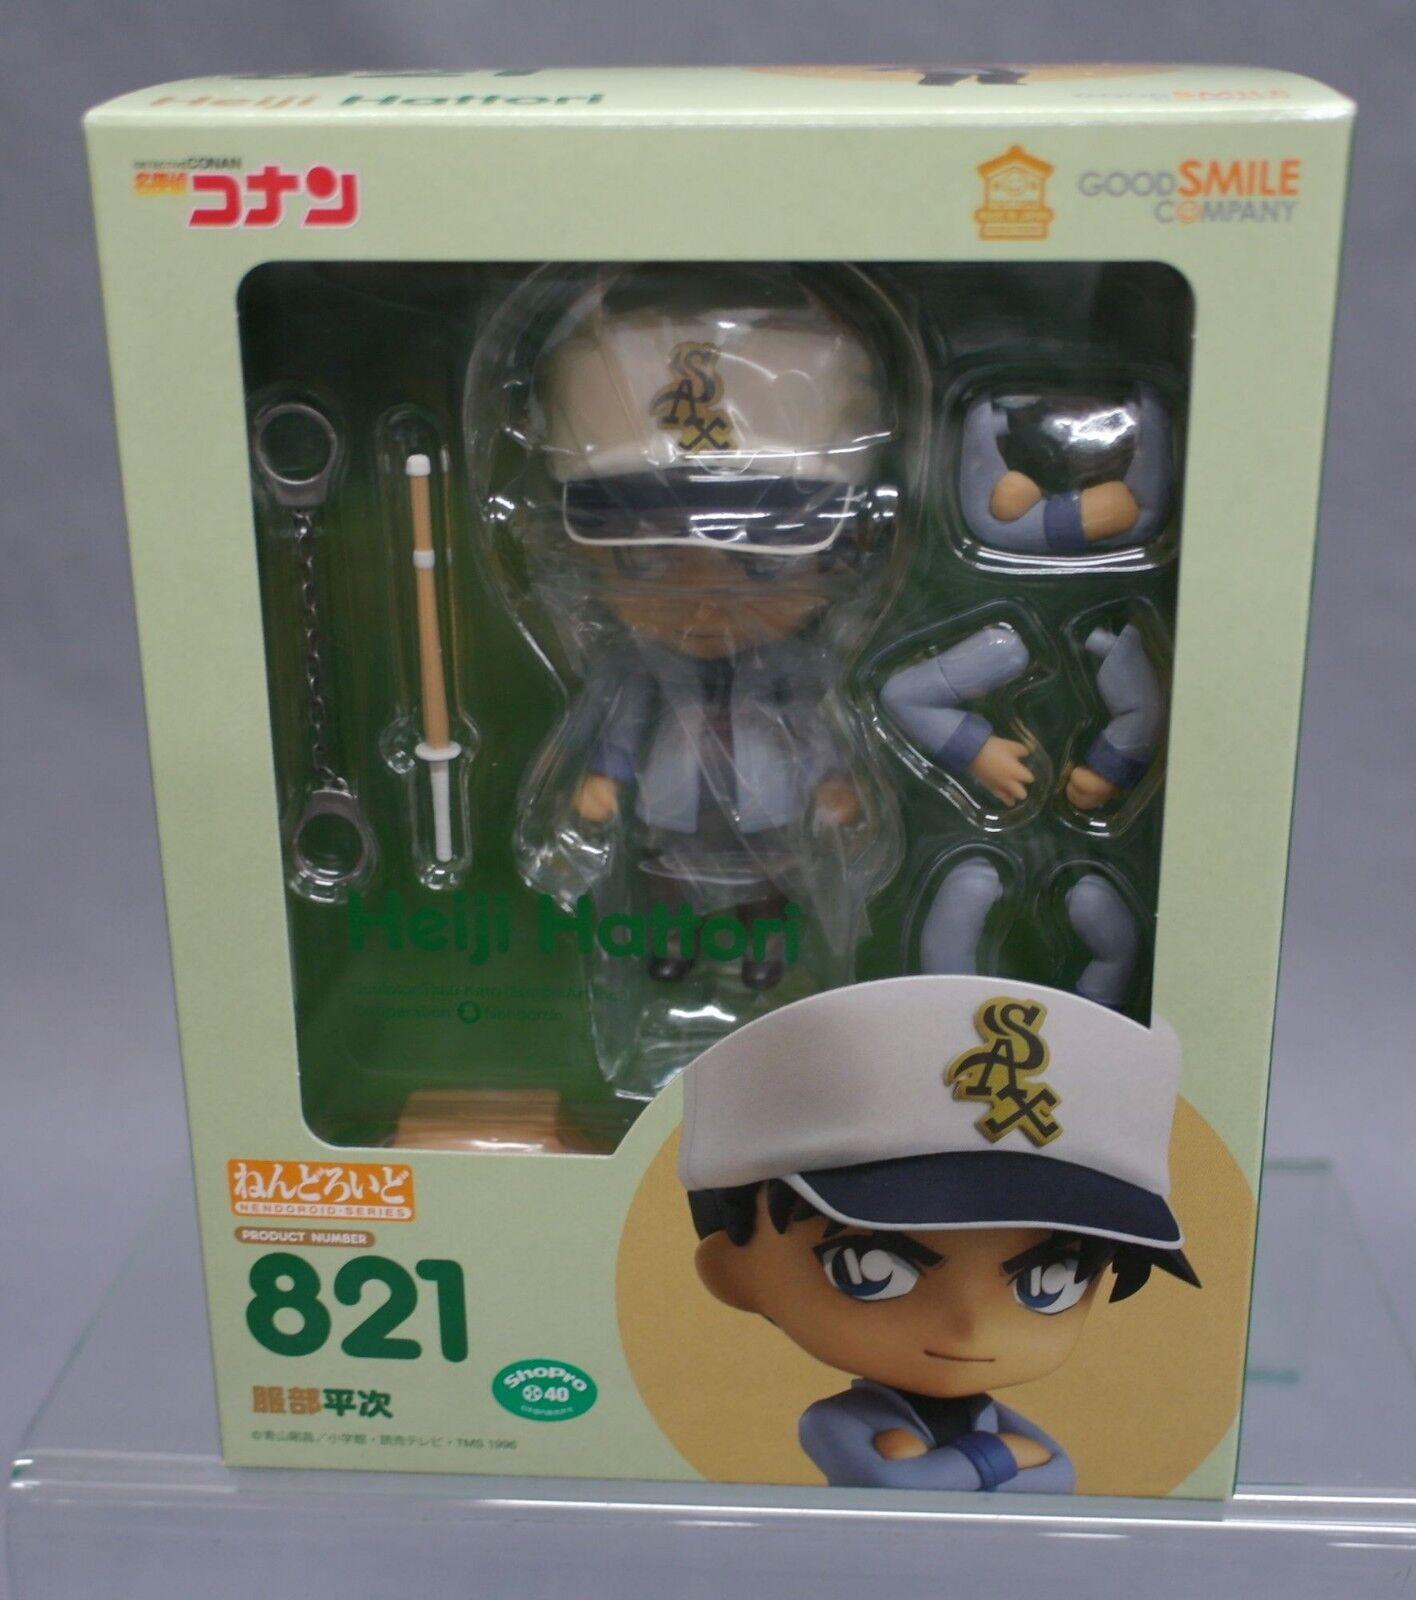 Nendgoldid Detective Conan Heiji Hattori Good Smile Company Japan New